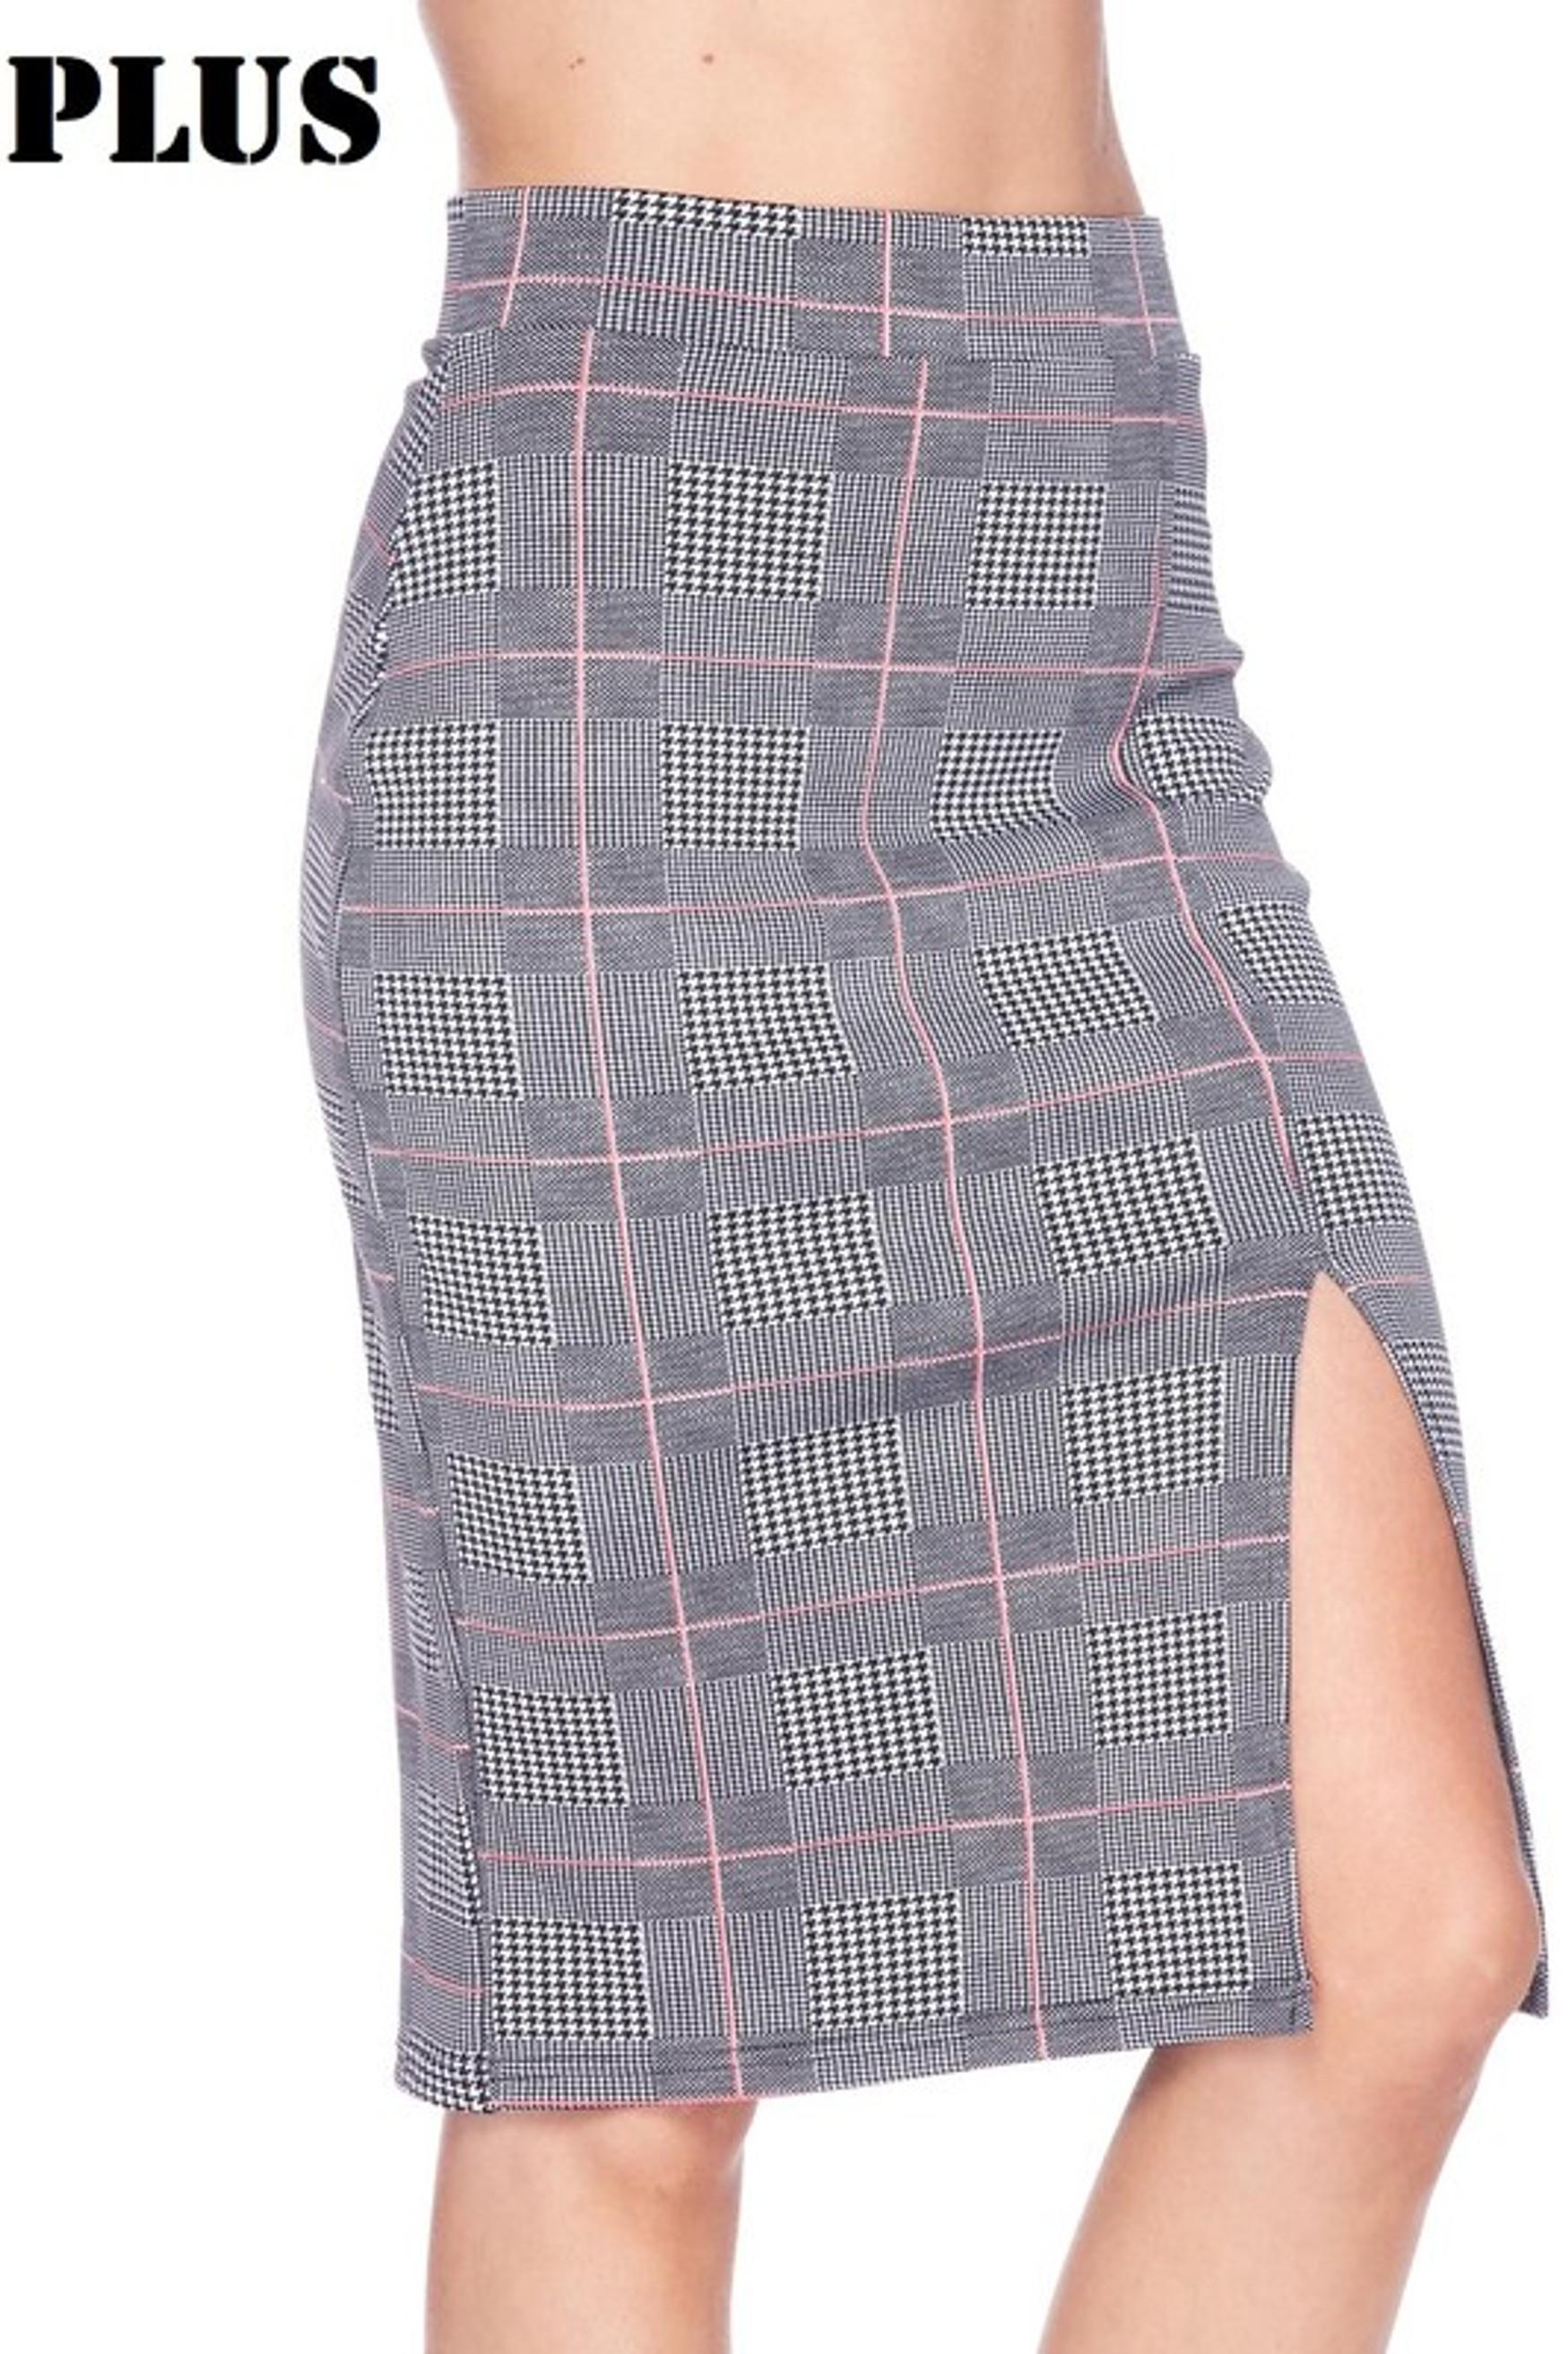 Silky Soft Scuba Coral Glen Plaid Plus Size Pencil Skirt with Front Slit